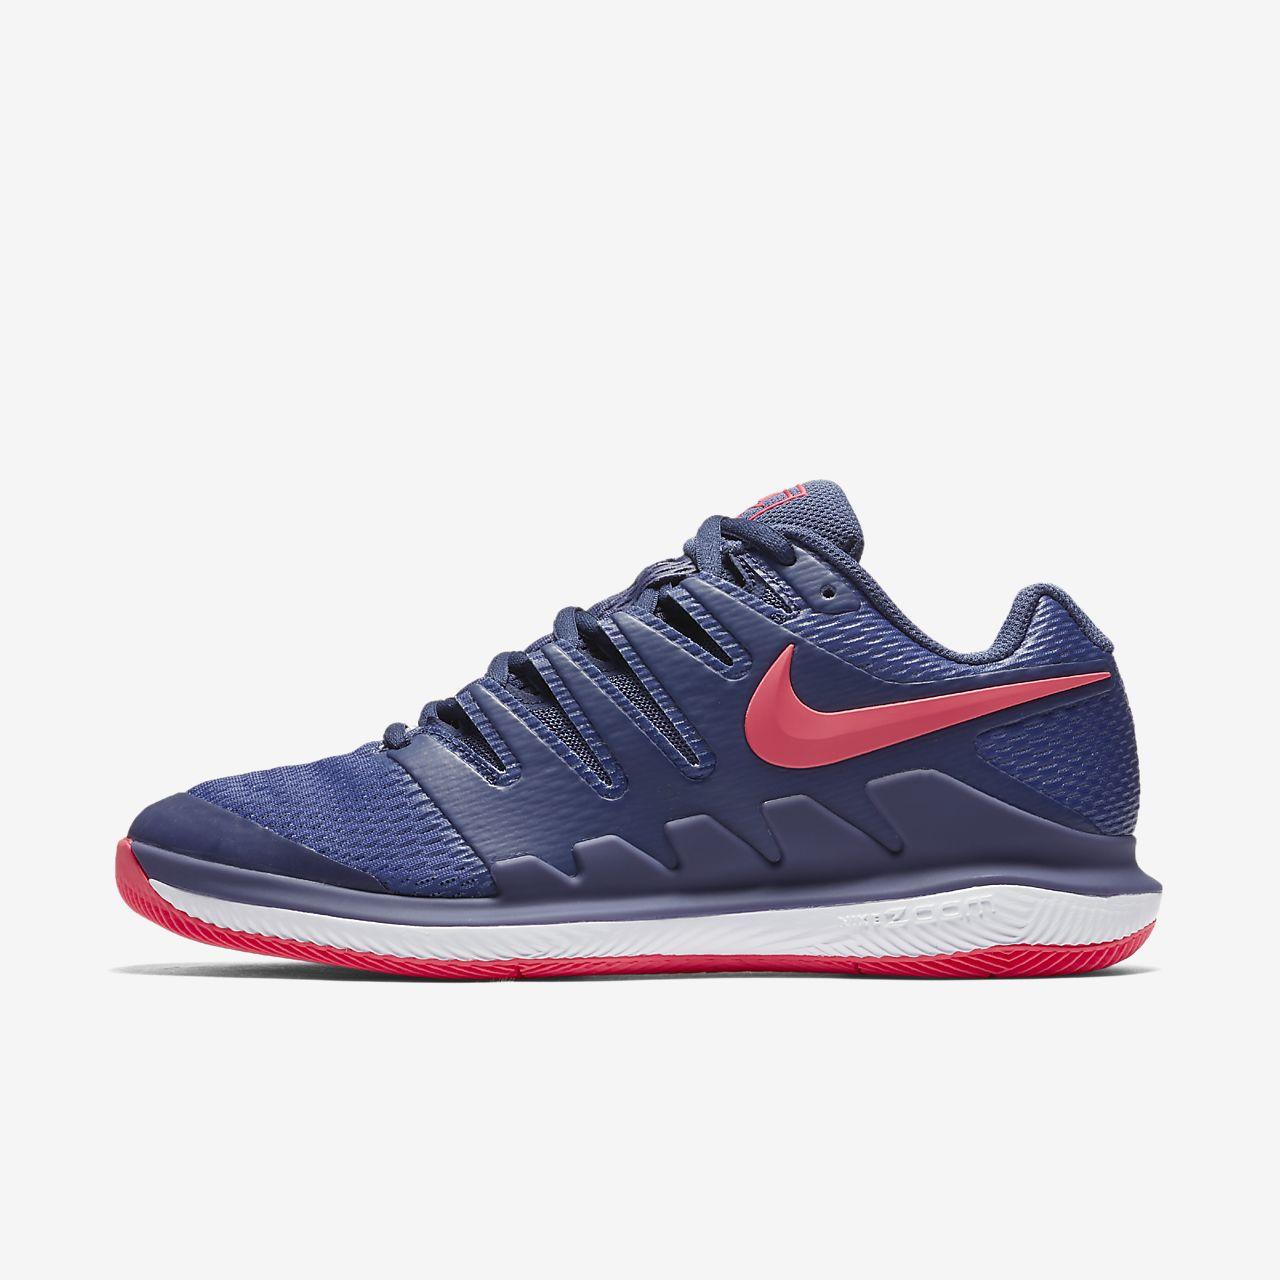 scarpe tennis nike vapor